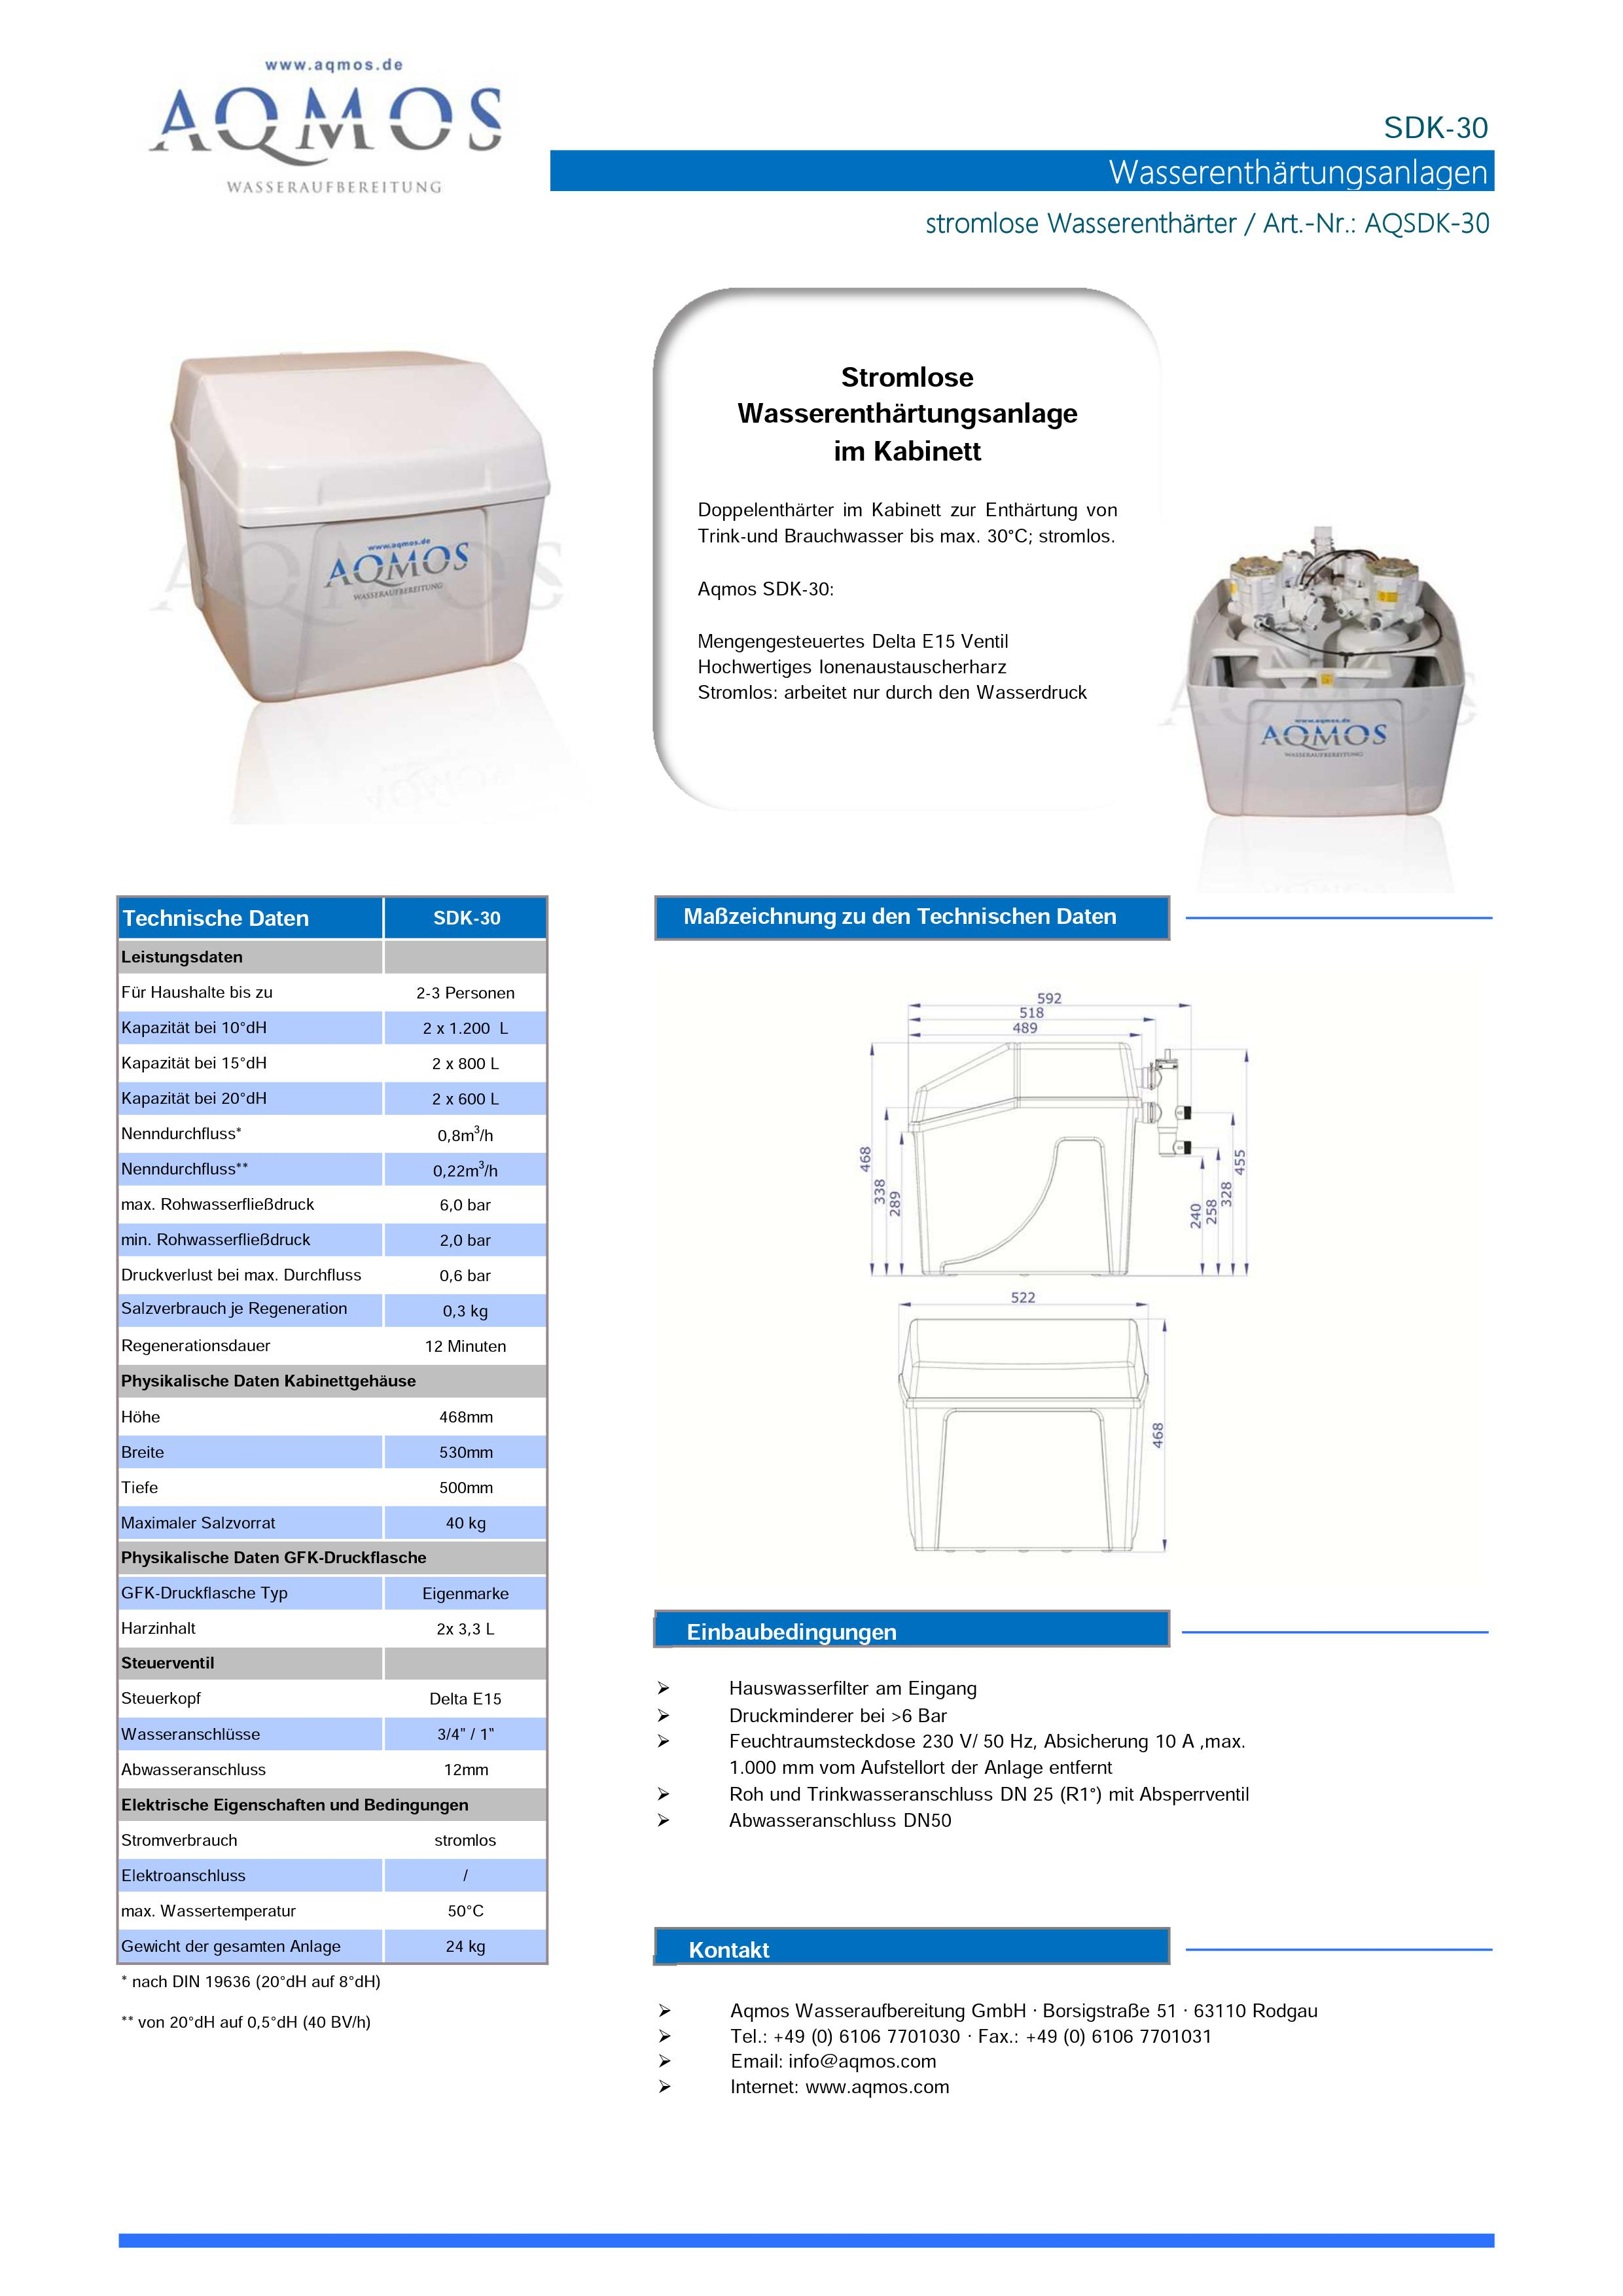 SDK-30-Datenblatt